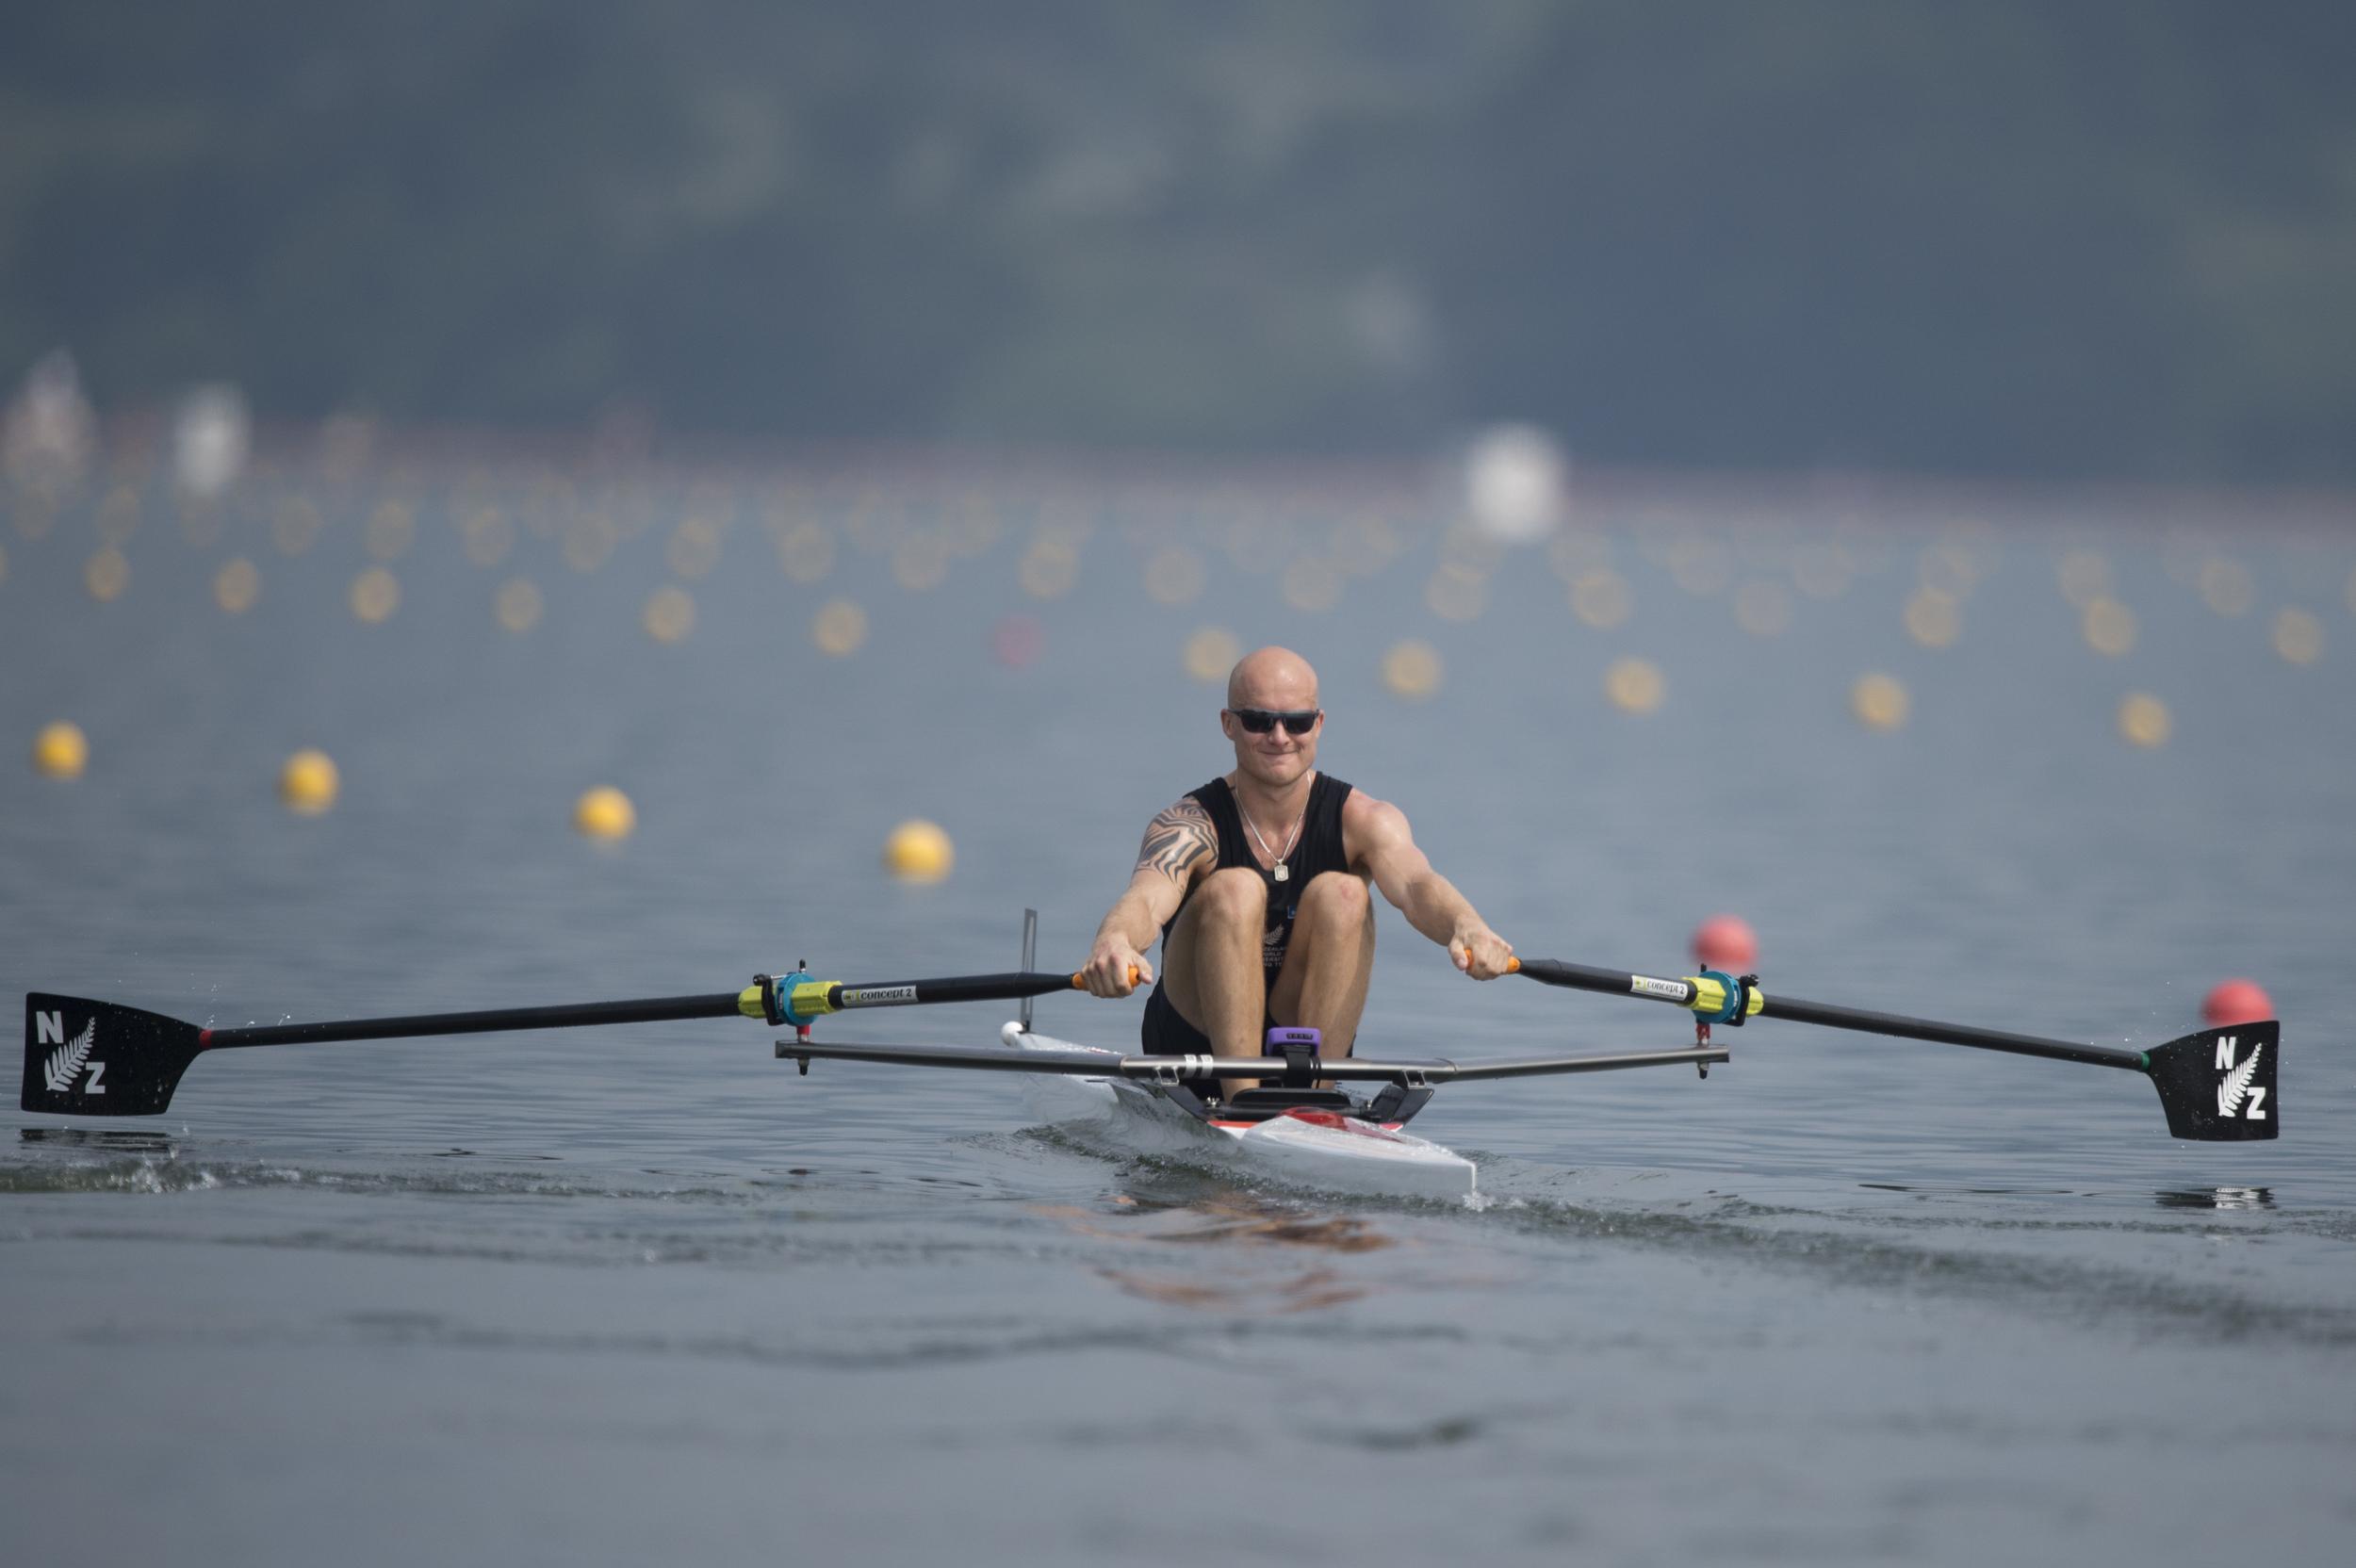 Toby Cunliffe-Steel - 2015 World University Games - Semi final - Photo © Rowing Celebration (8).jpg